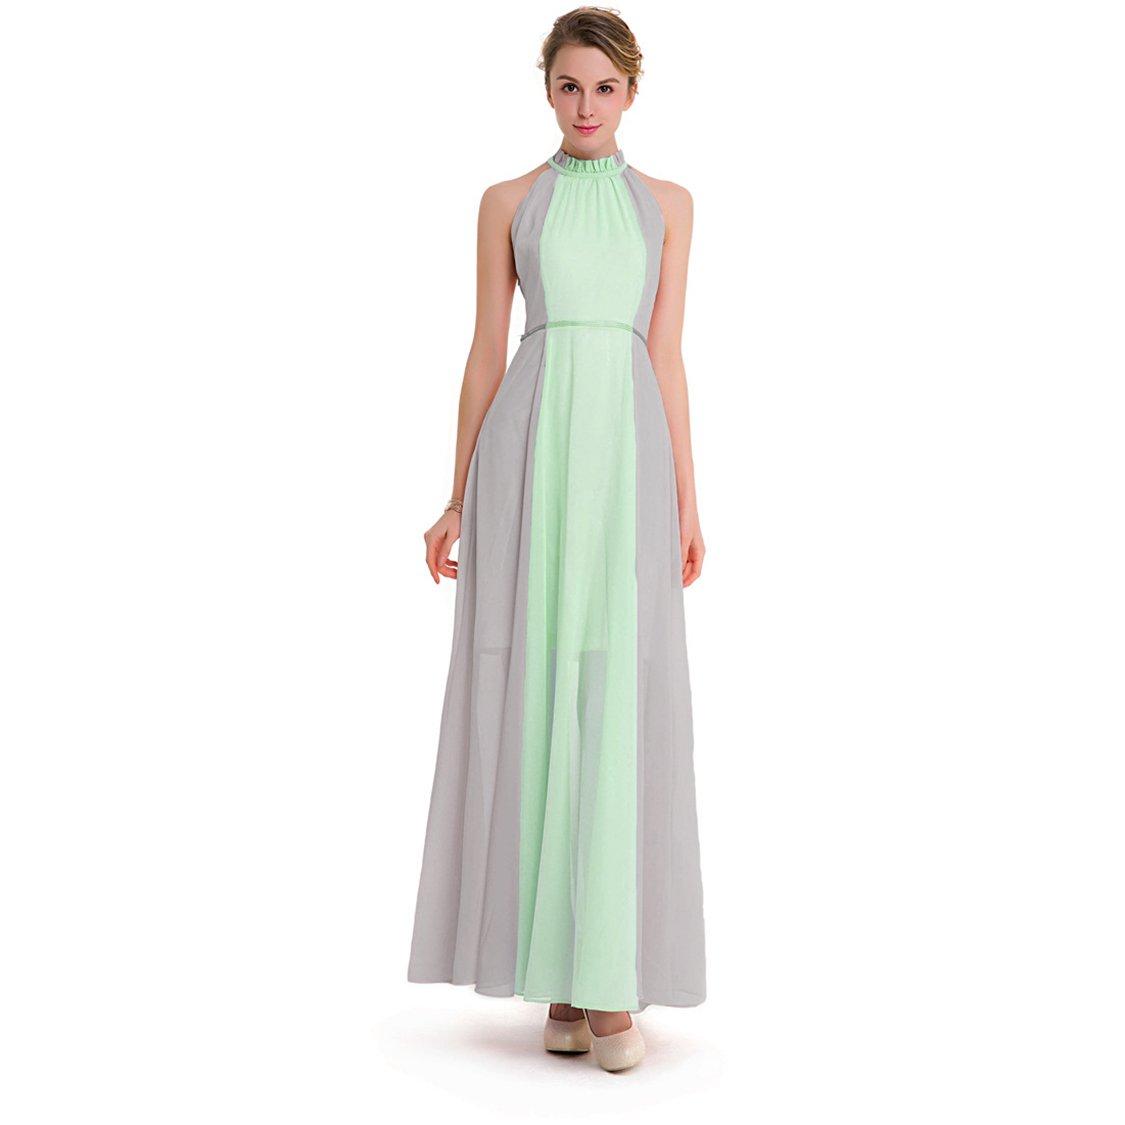 Amazon.com: BXYR Ladys Dress Womens Dresses Chiffon Gradient Sleeveless Off Shoulder Big Pendulum Long Dress Party Beach Daily Casual Home Temperament ...